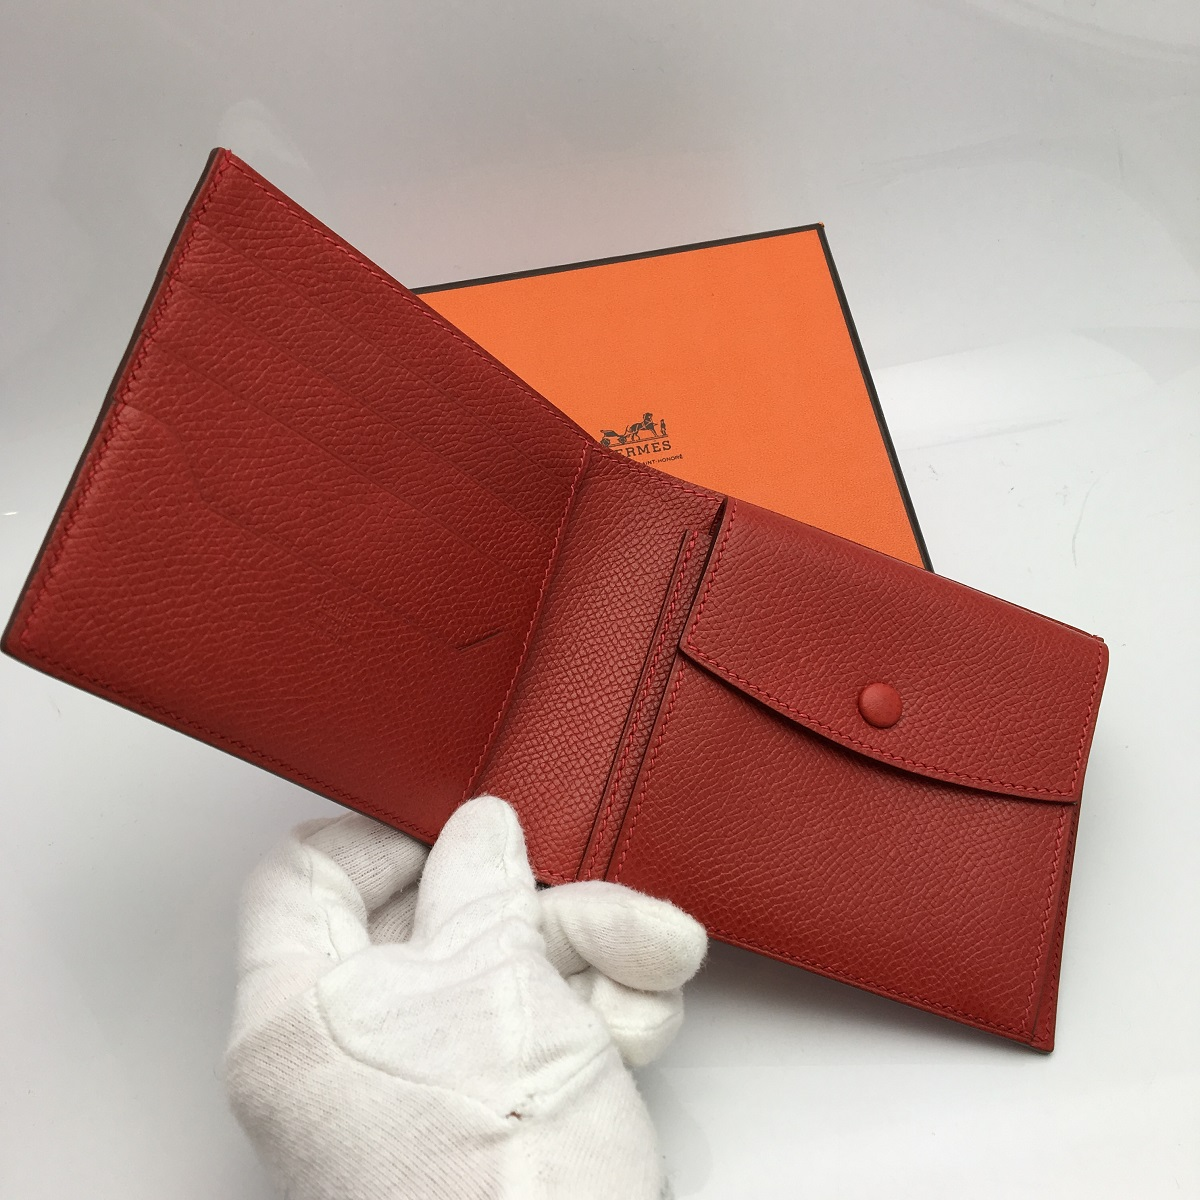 e30dc0ff36fd ブランド名: エルメス商品名: ガリレイ 二つ折財布商品ランク: 新品同様品素材: エプソンカラー: レッド刻印: I刻印サイズ:  約W11cm×H9.5cm×D1.5cm